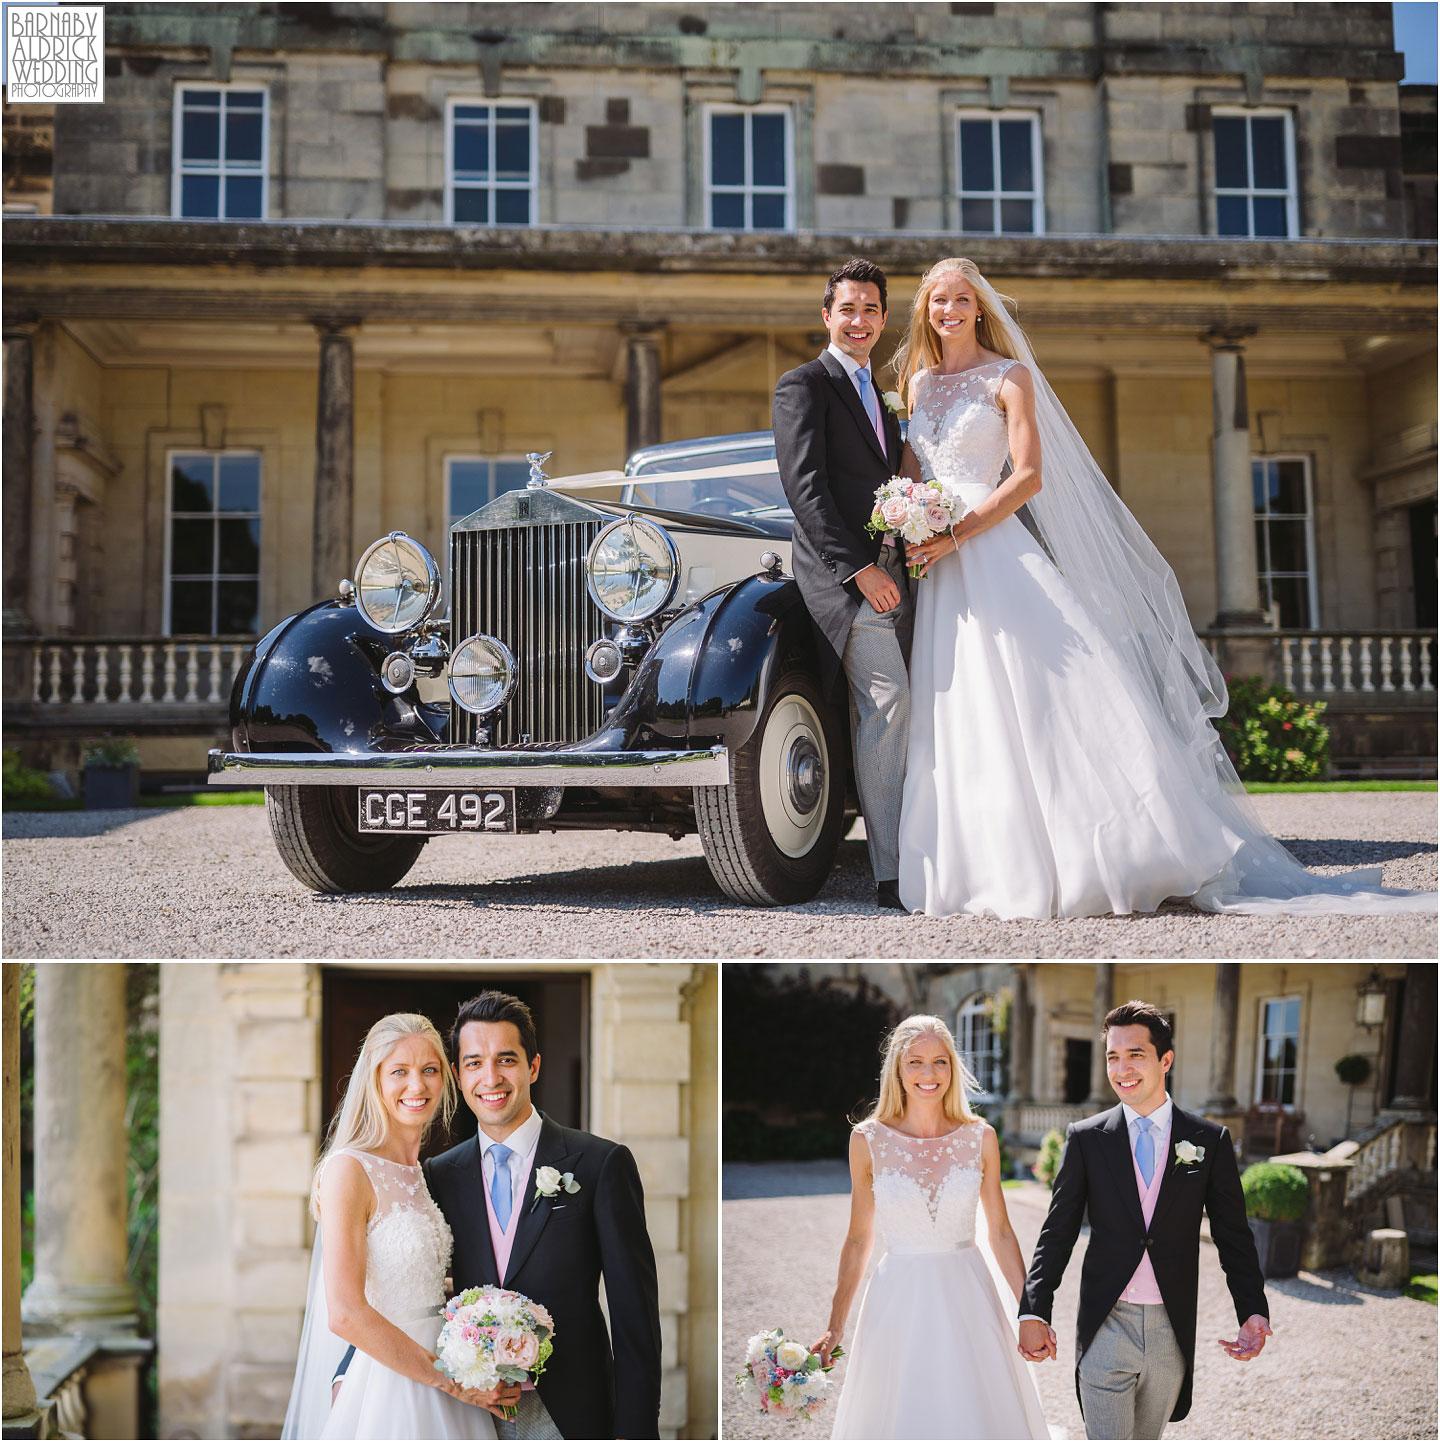 Wedding photos at Birdsall House